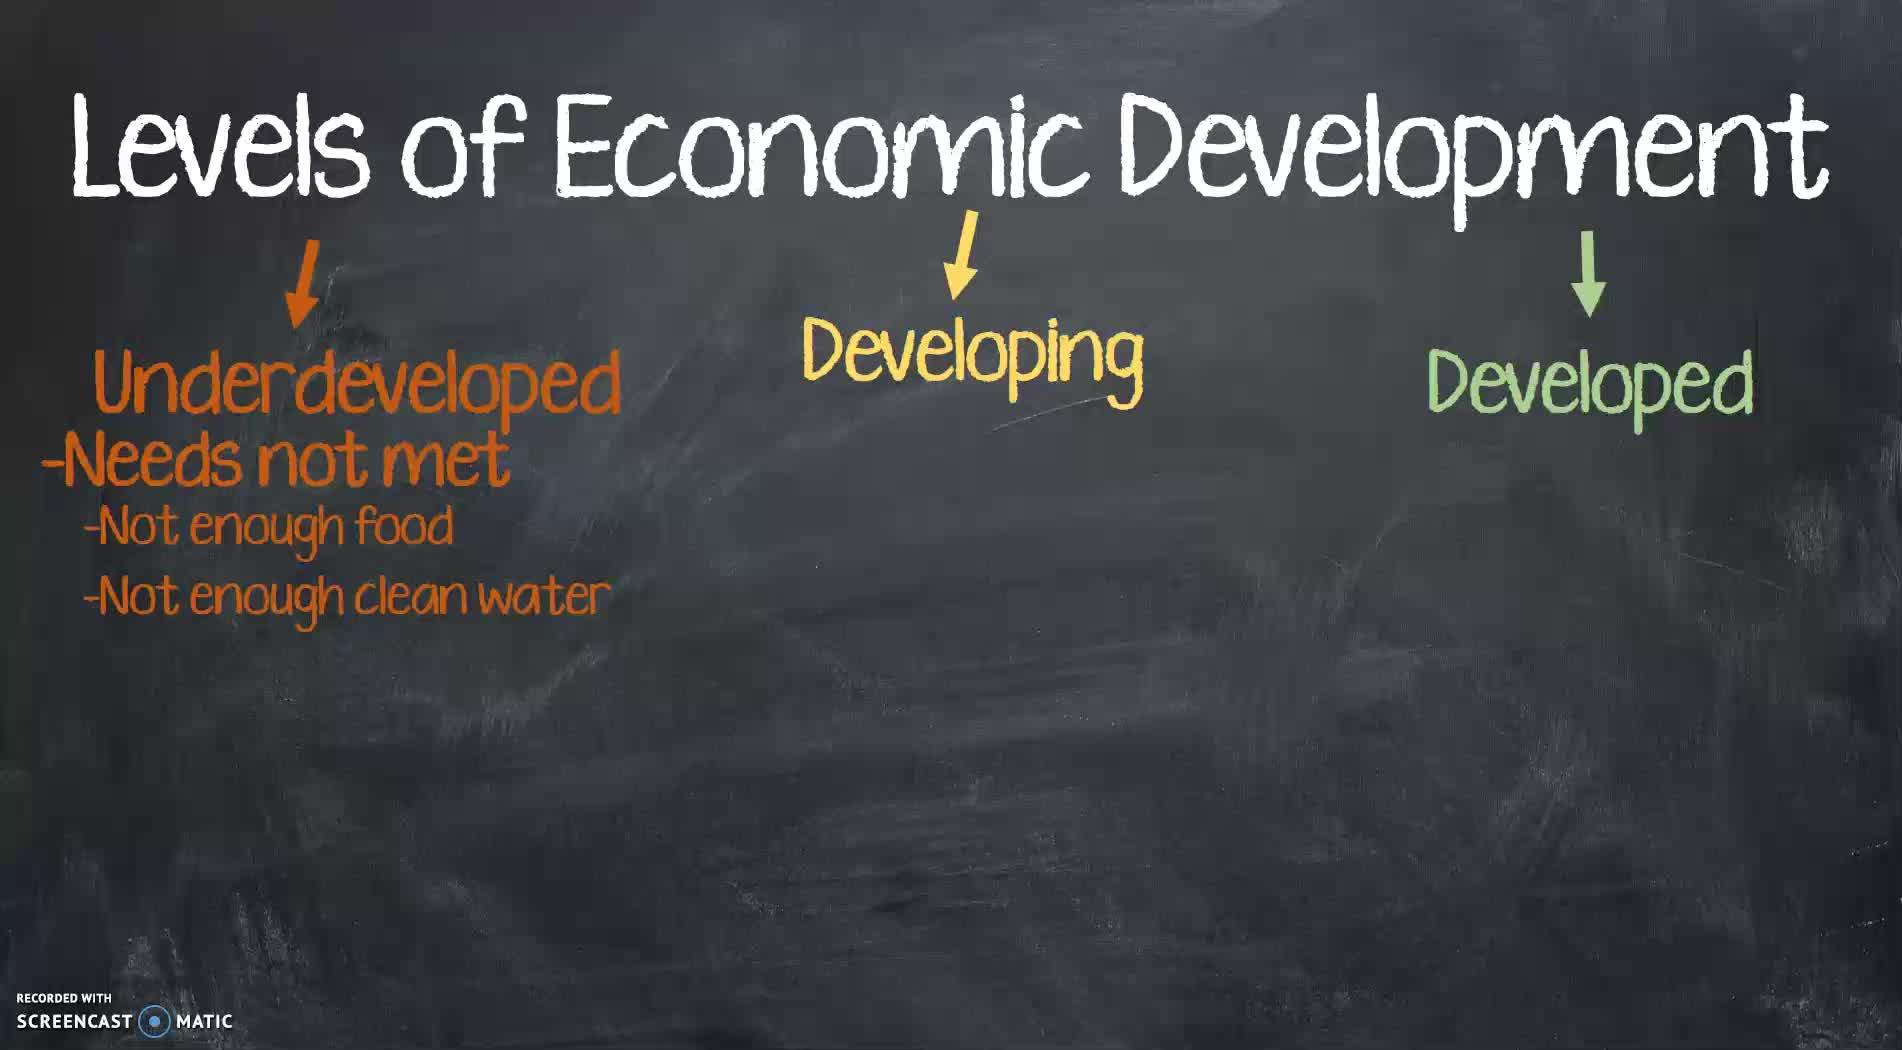 MBeran Levels of Economic Development